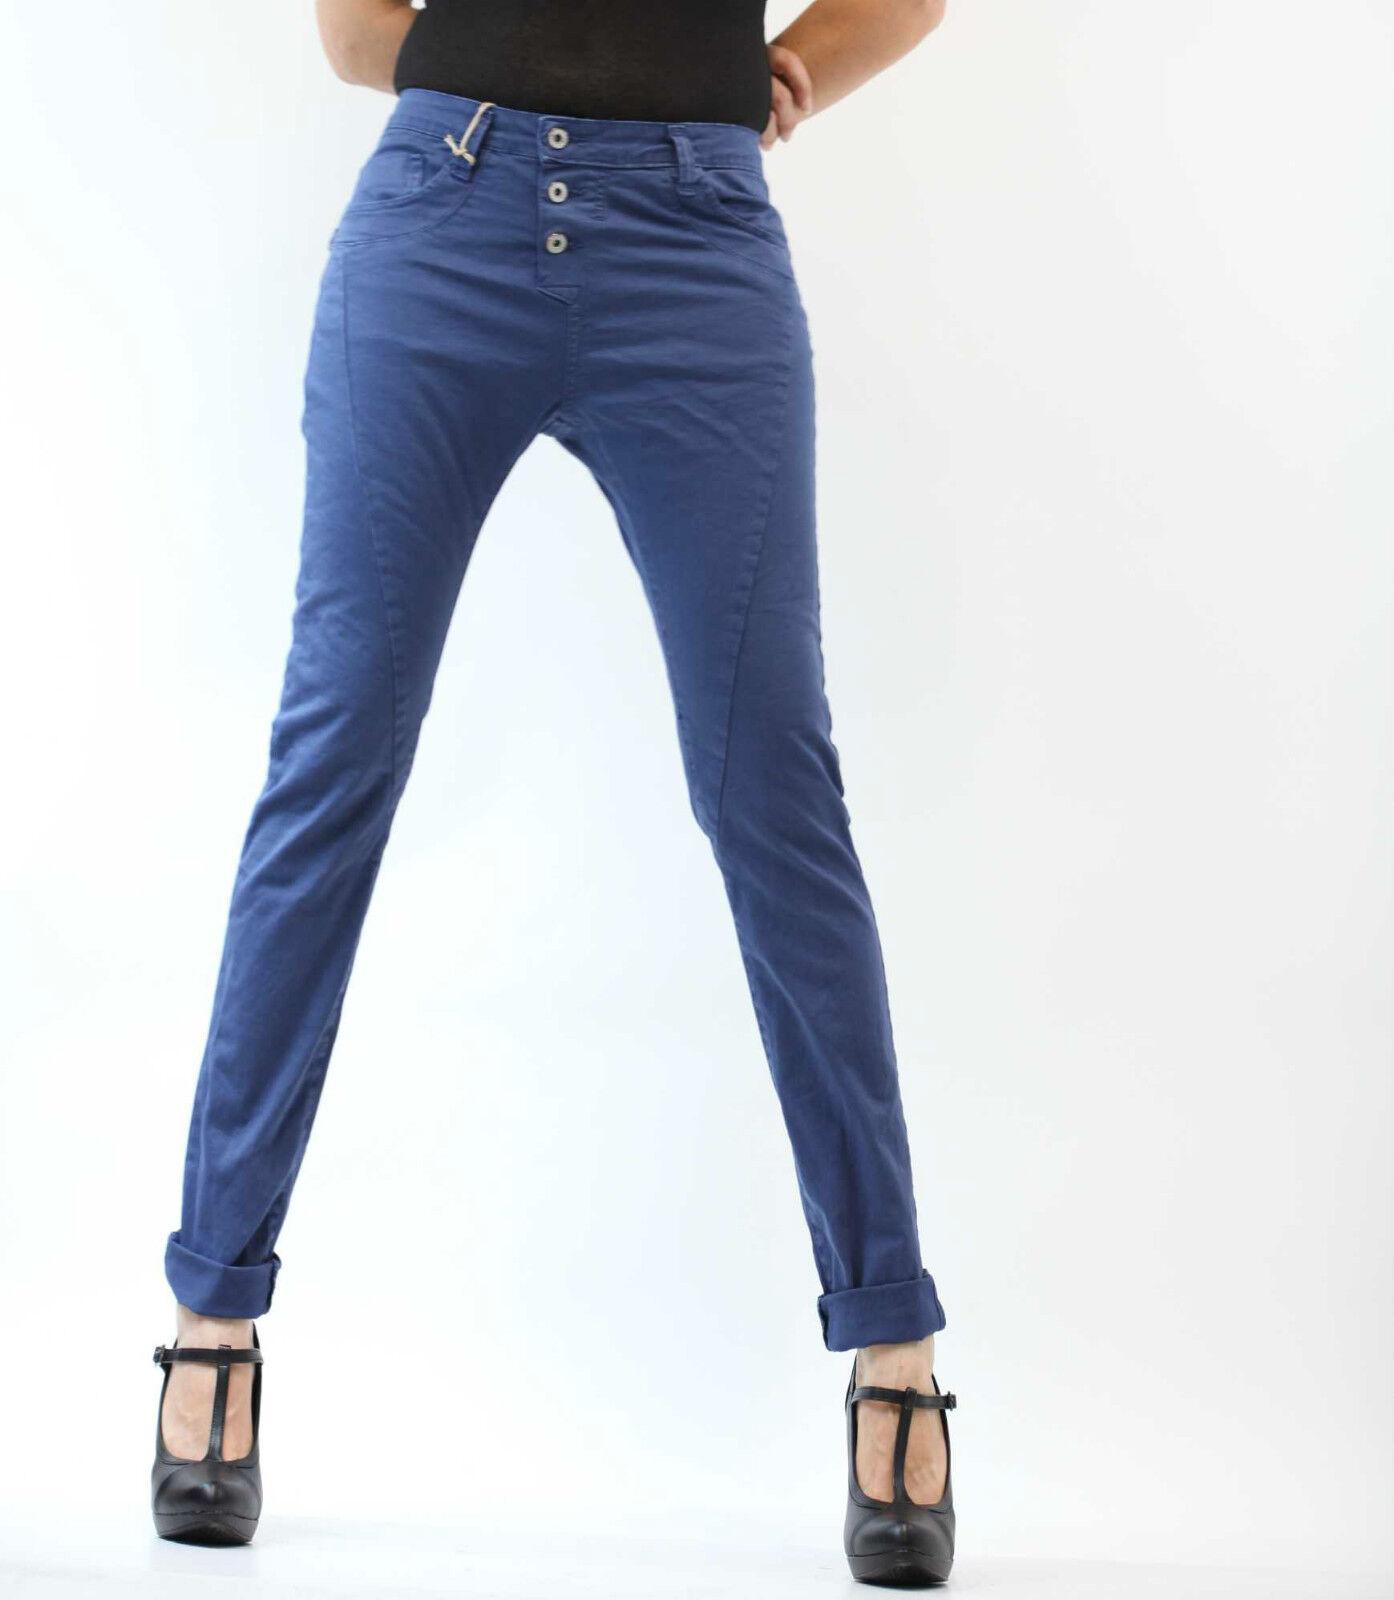 PLEASE Jeans P78ADT6TD boyfriend damen Baggy cavallo lungo 3 bottoni -Blu Persia